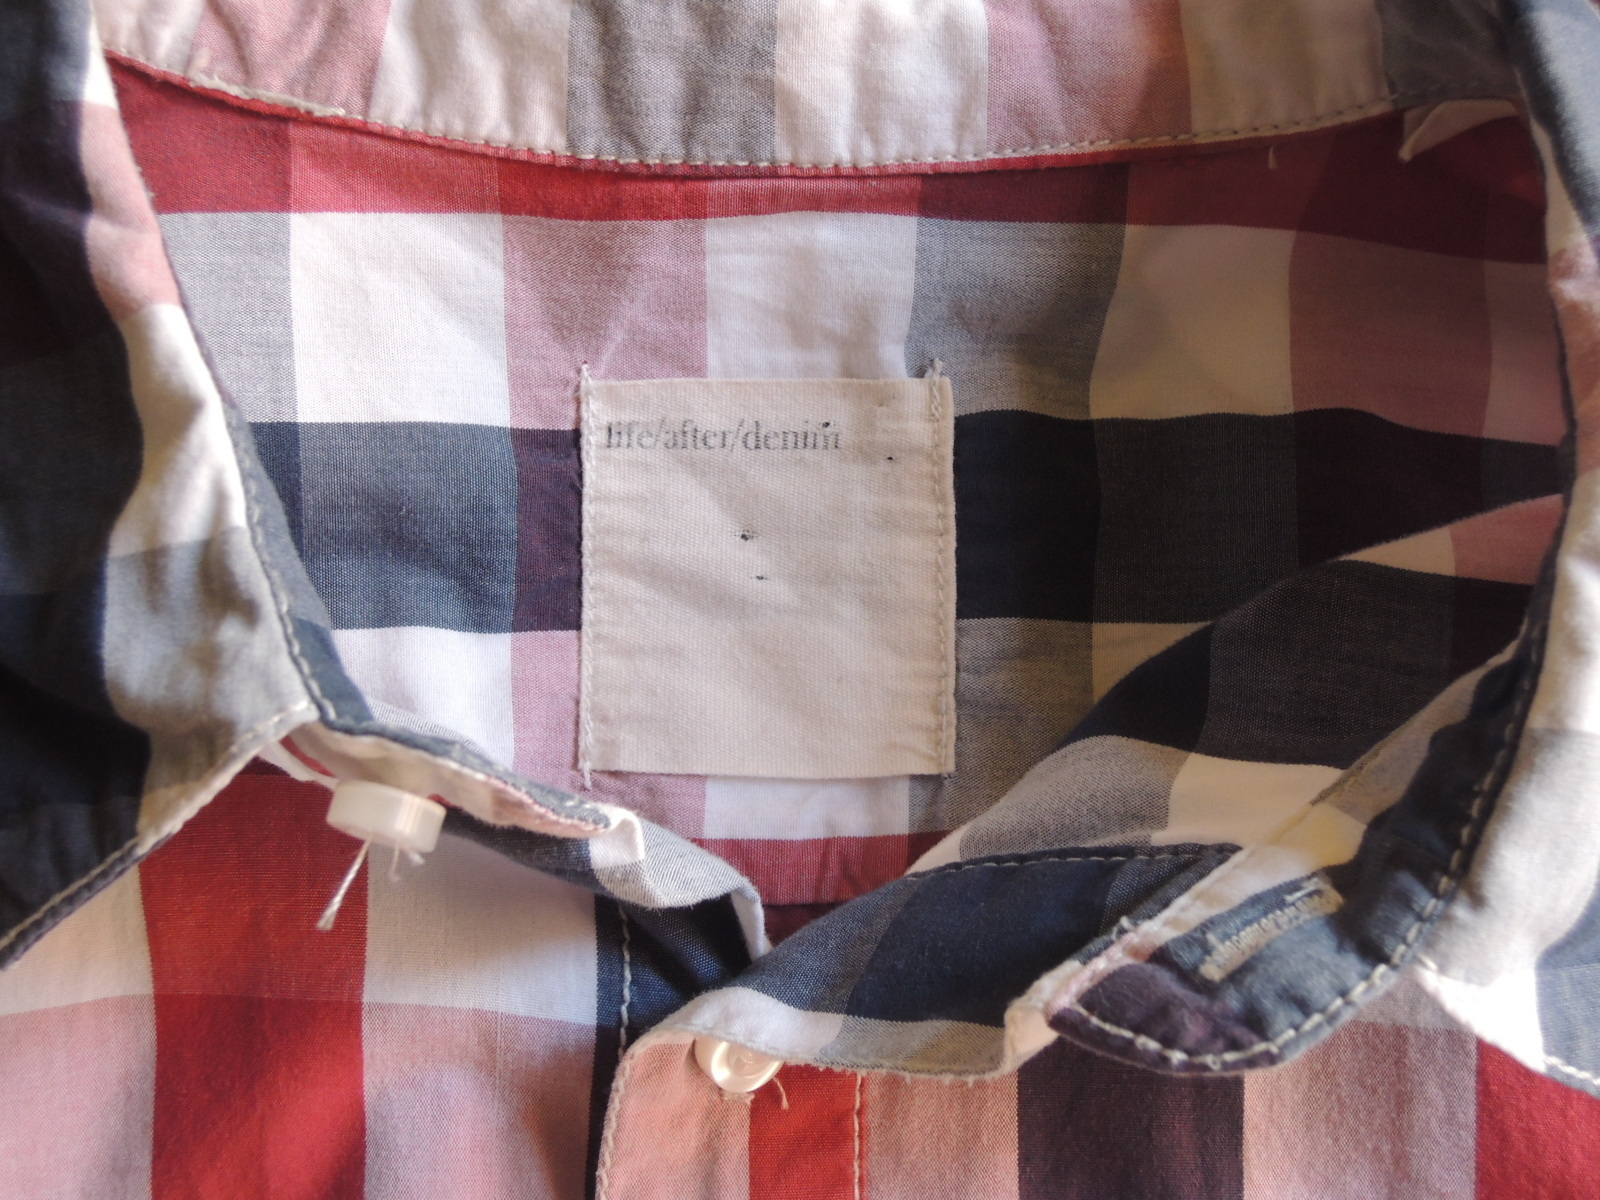 lifeafterdenimblockcheckshirts05.JPG